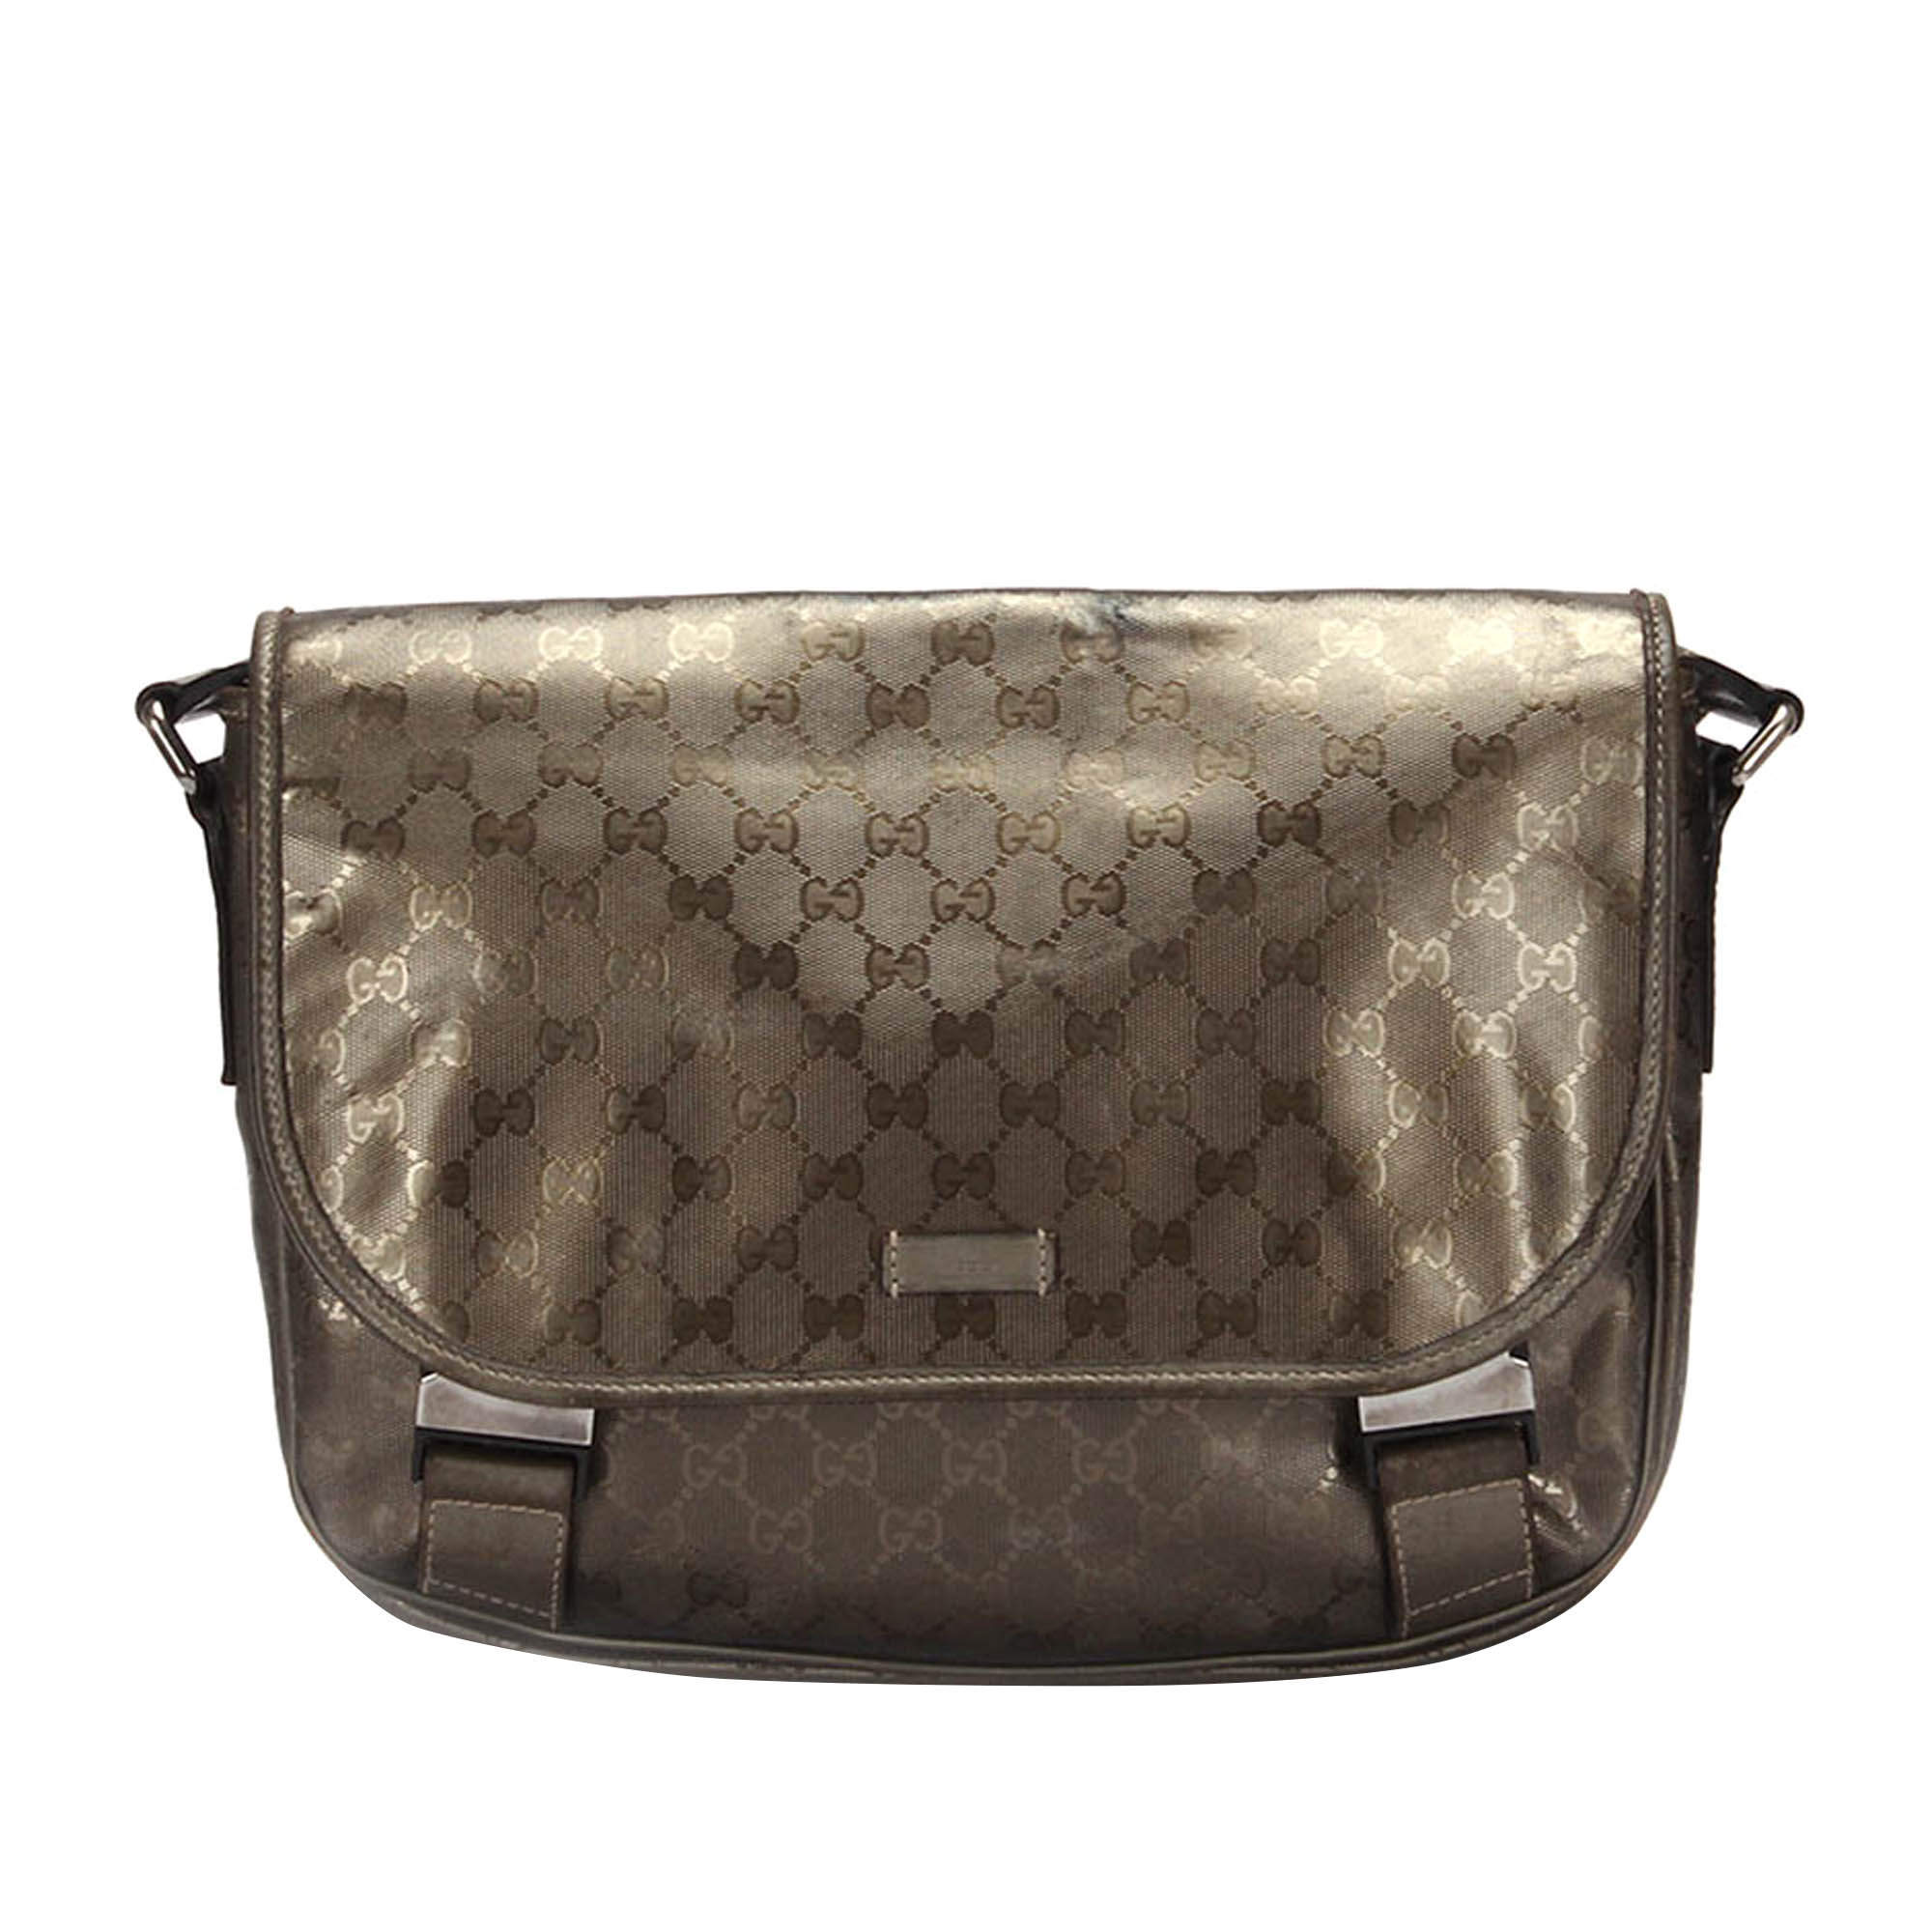 Gucci Brown GG Imprime Canvas Crossbody Bag